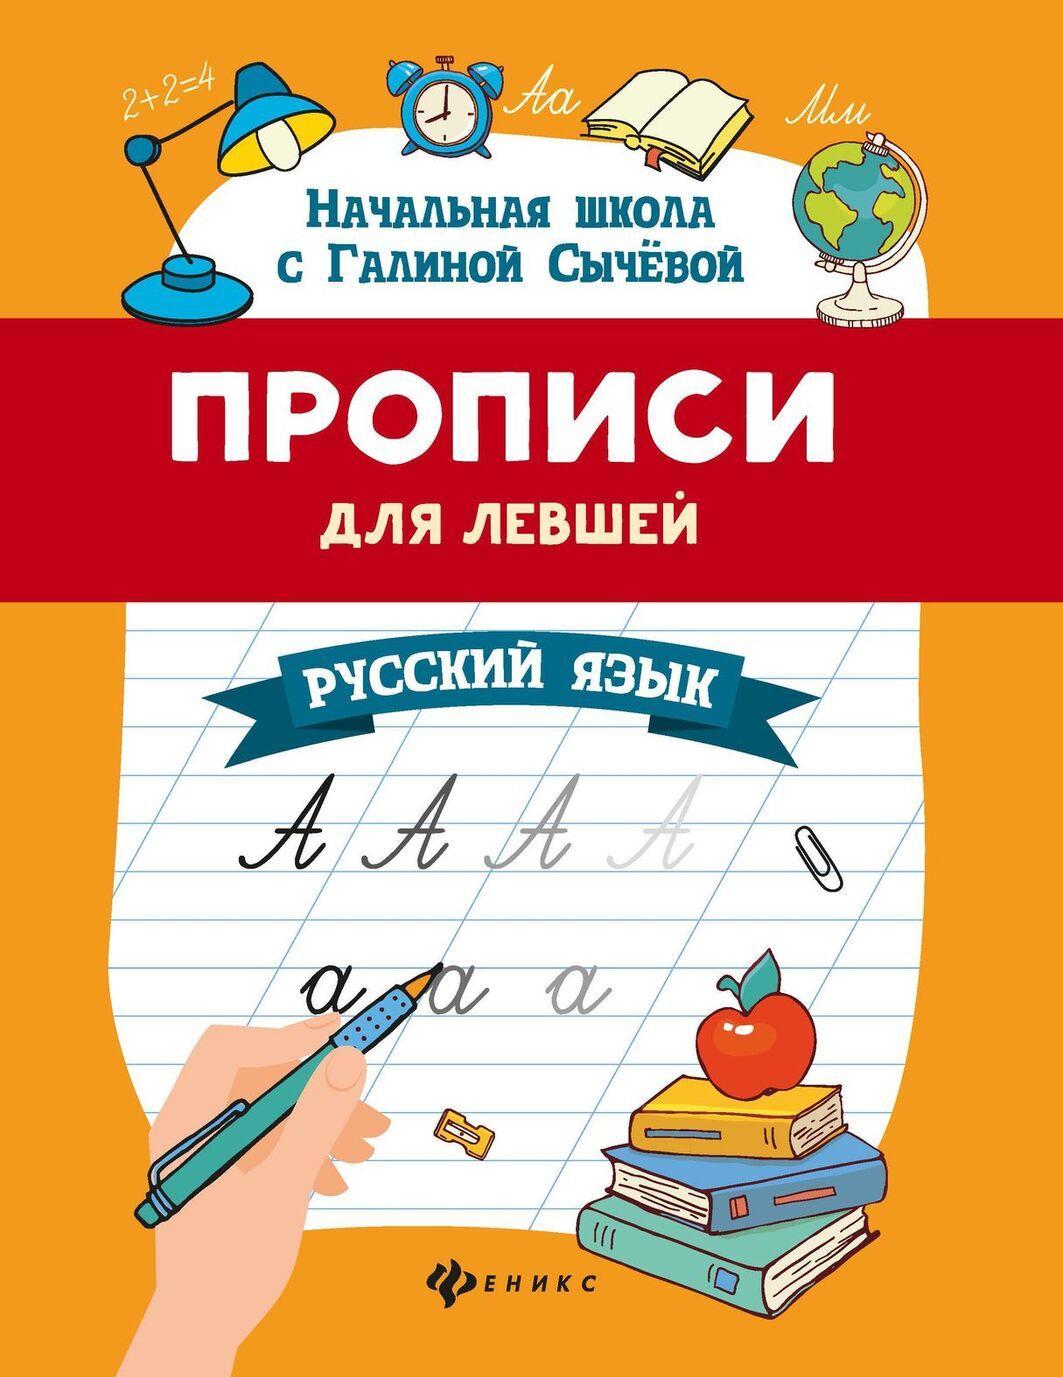 Propisi dlja levshej. Russkij jazyk | Sycheva Galina Nikolaevna